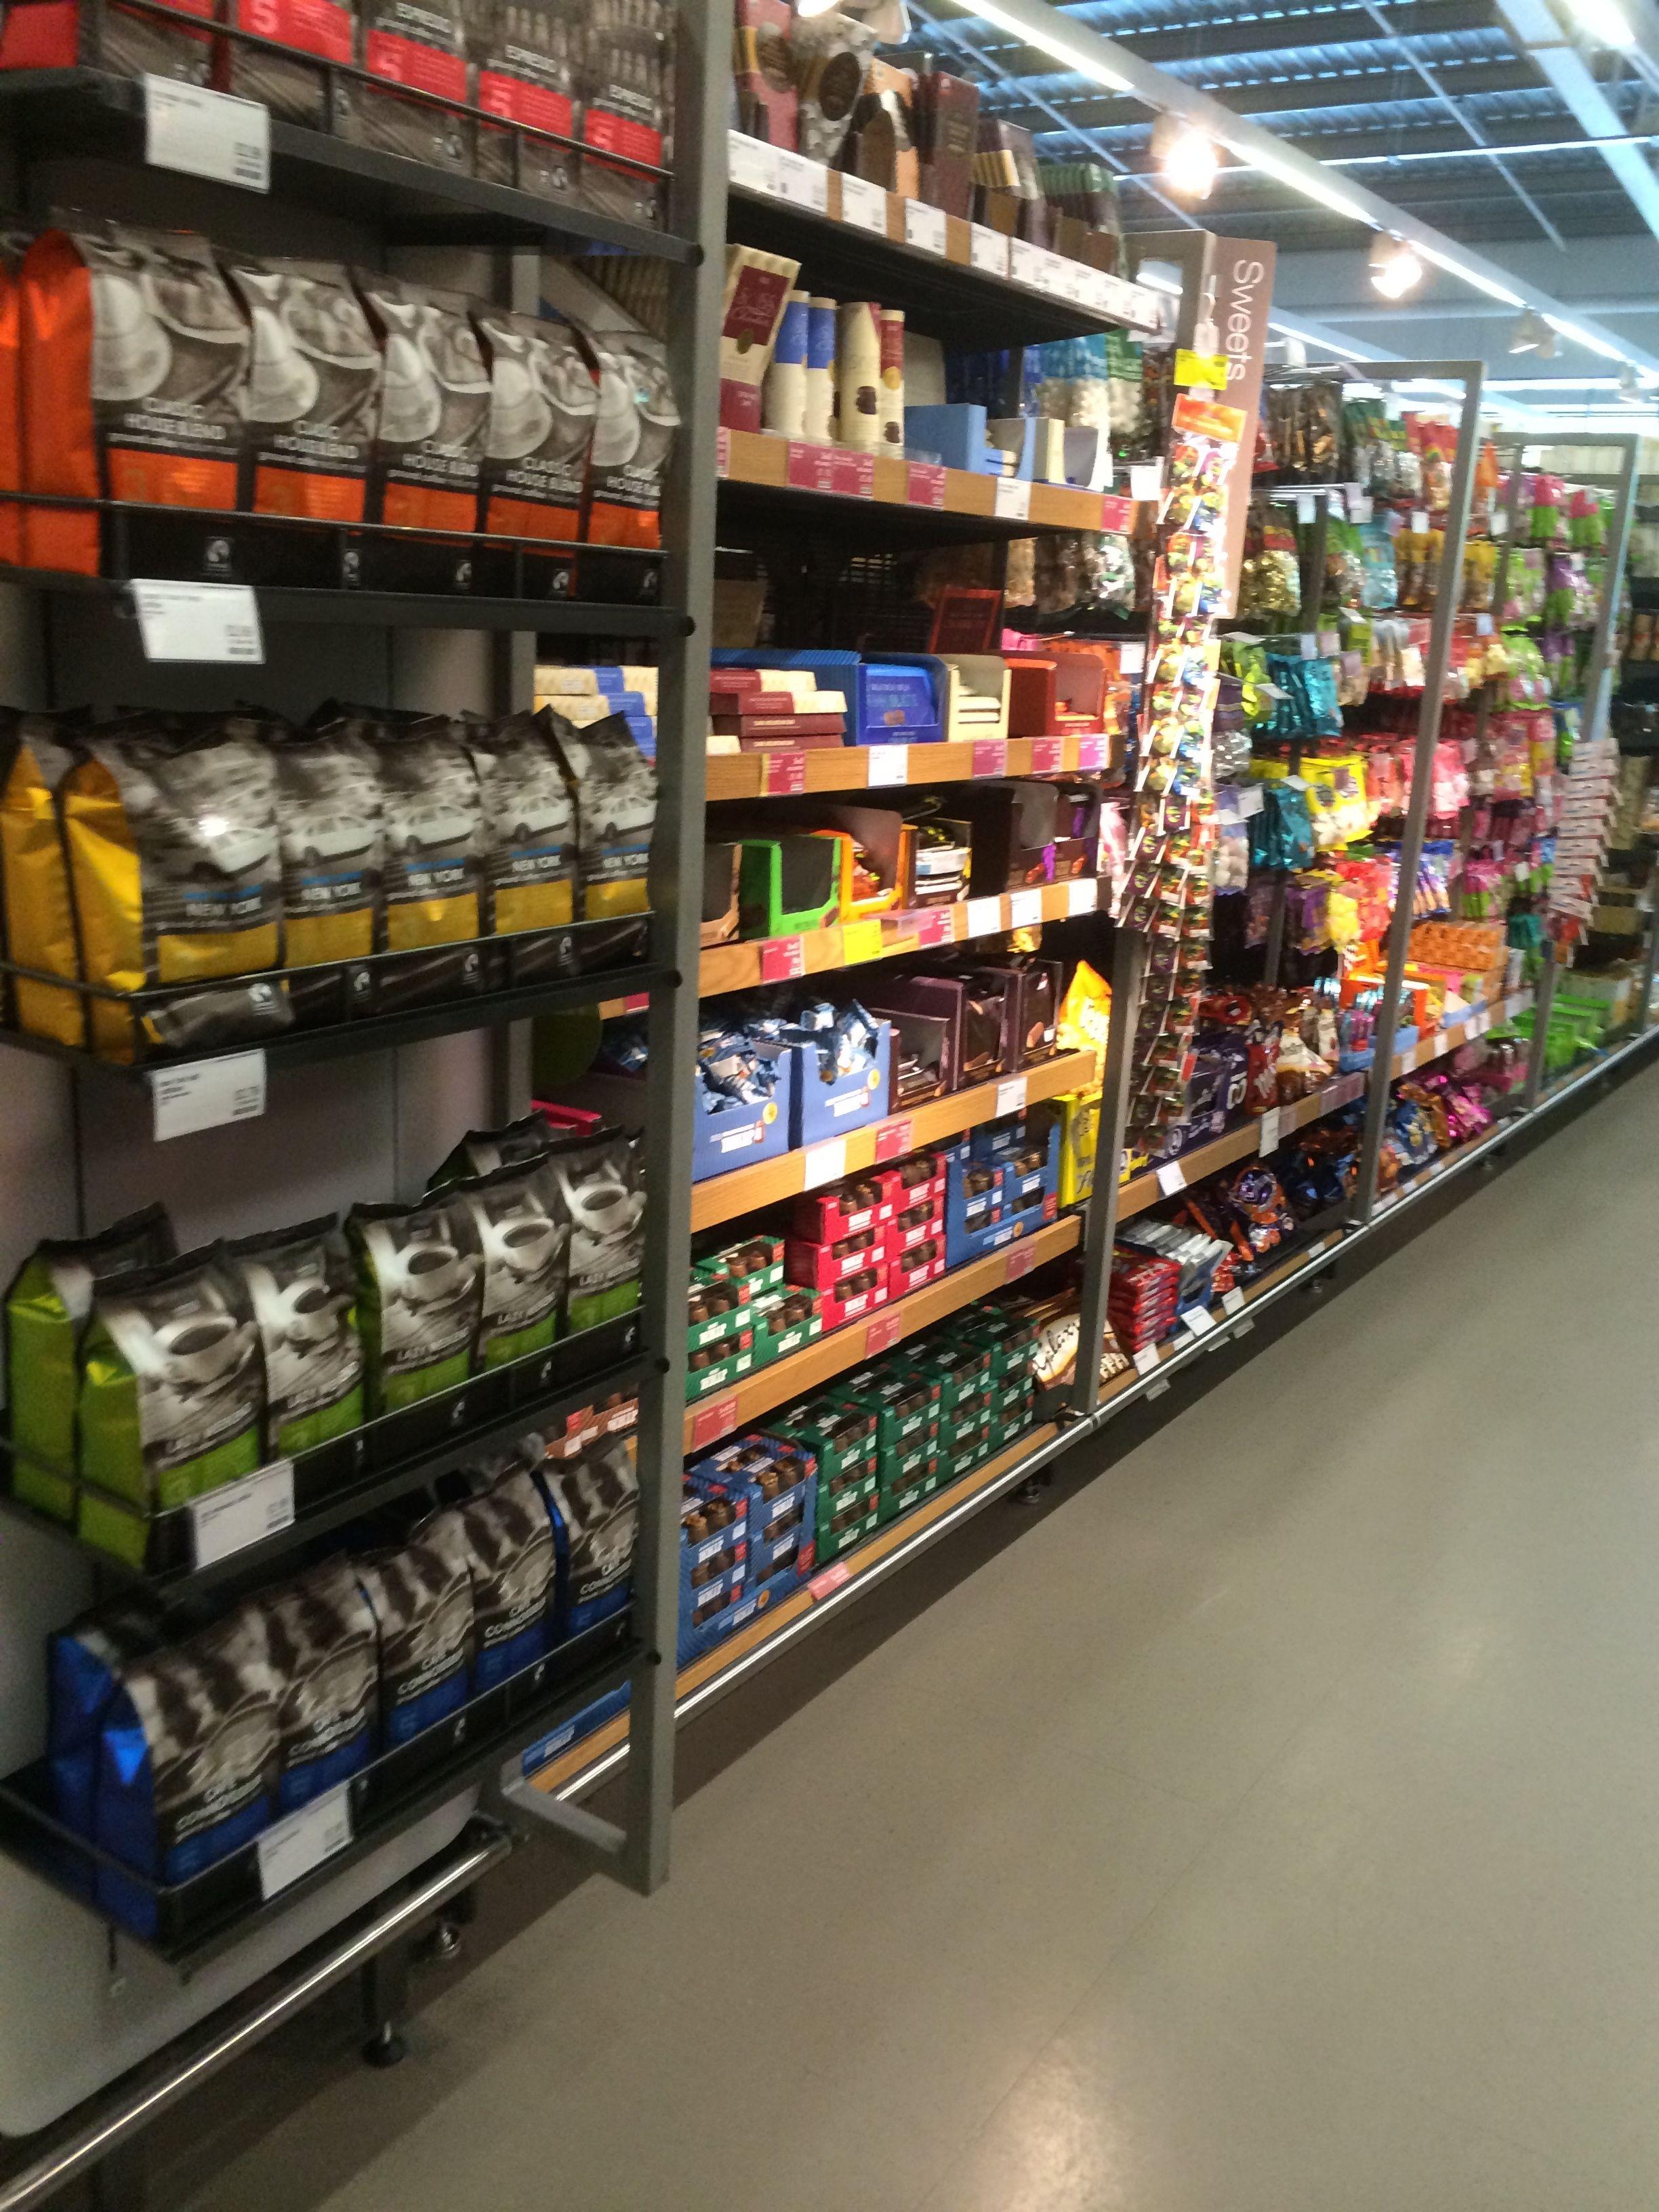 M&S Shoreham Foodhall Food Supermarket Layout